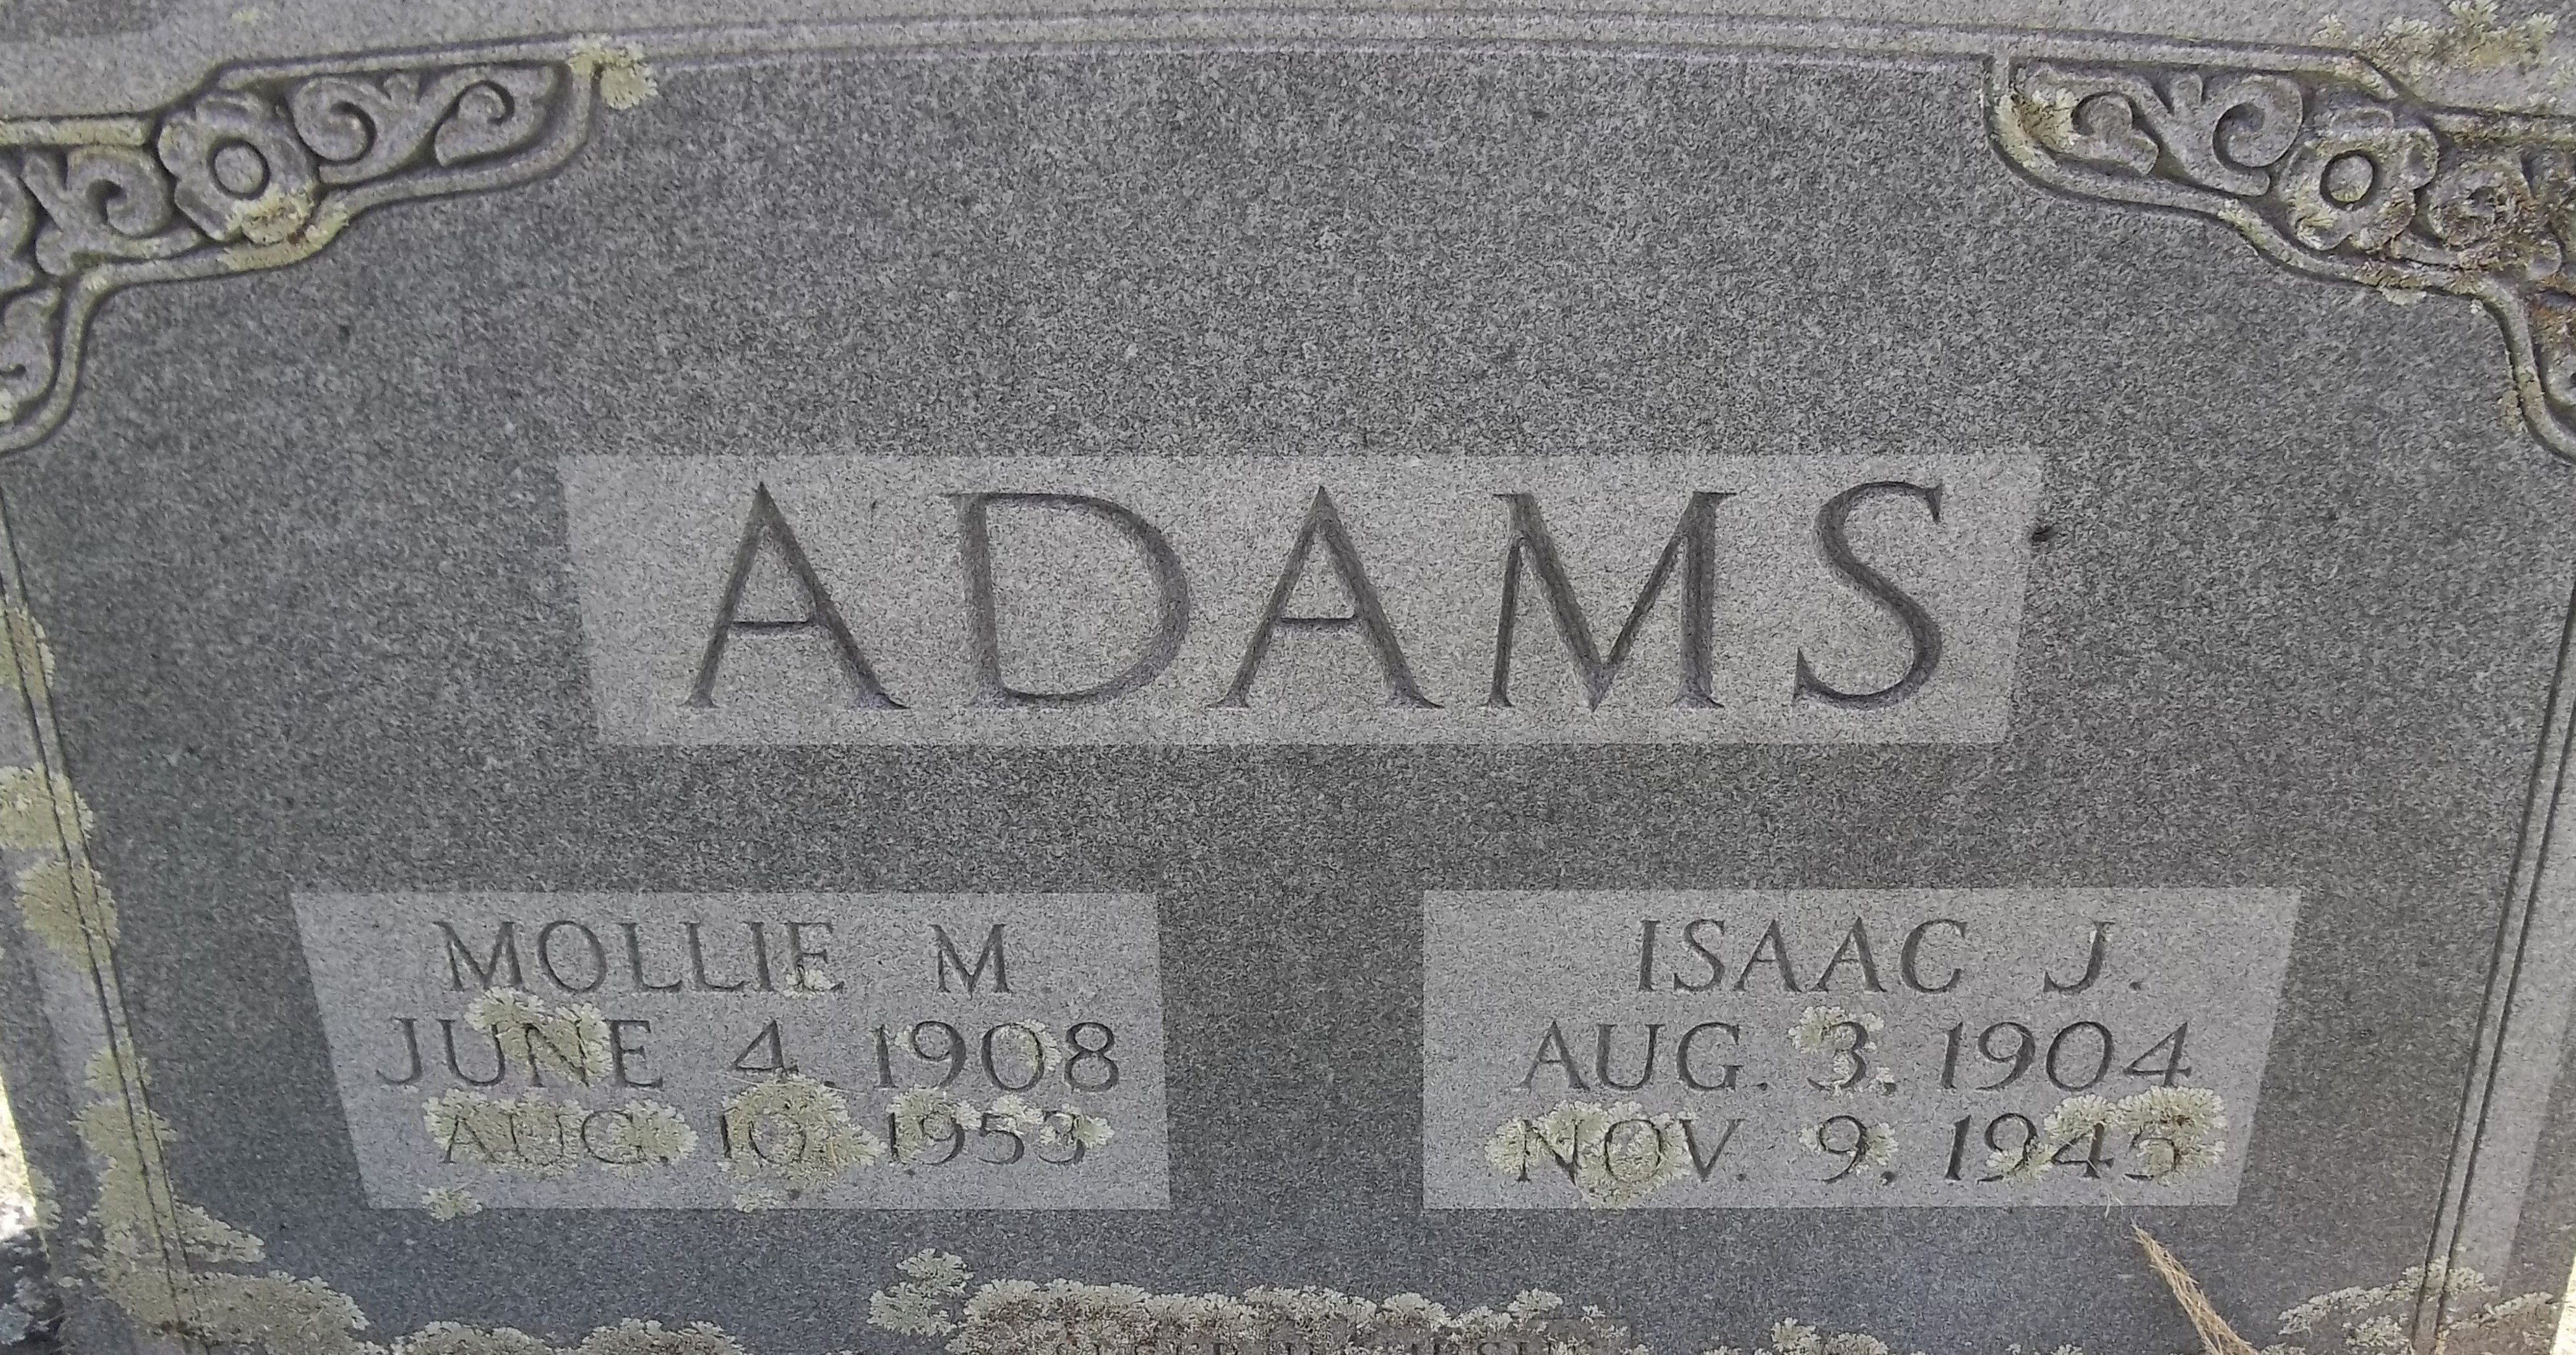 Mollie M. Adams